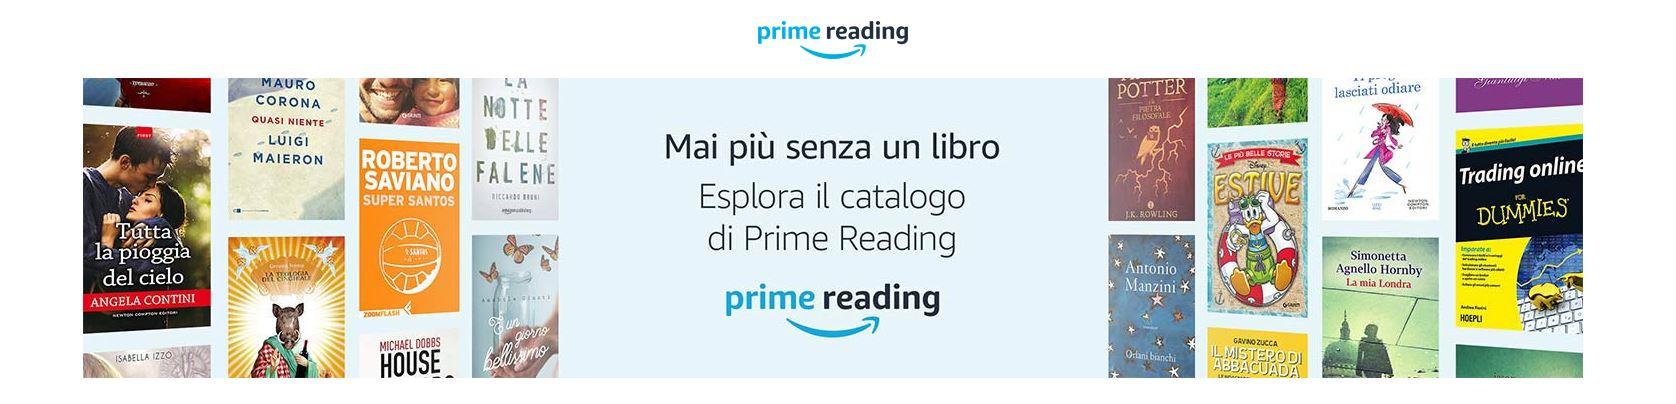 Amazon lancia Prime Reading, ebook gratis per i clienti Prime